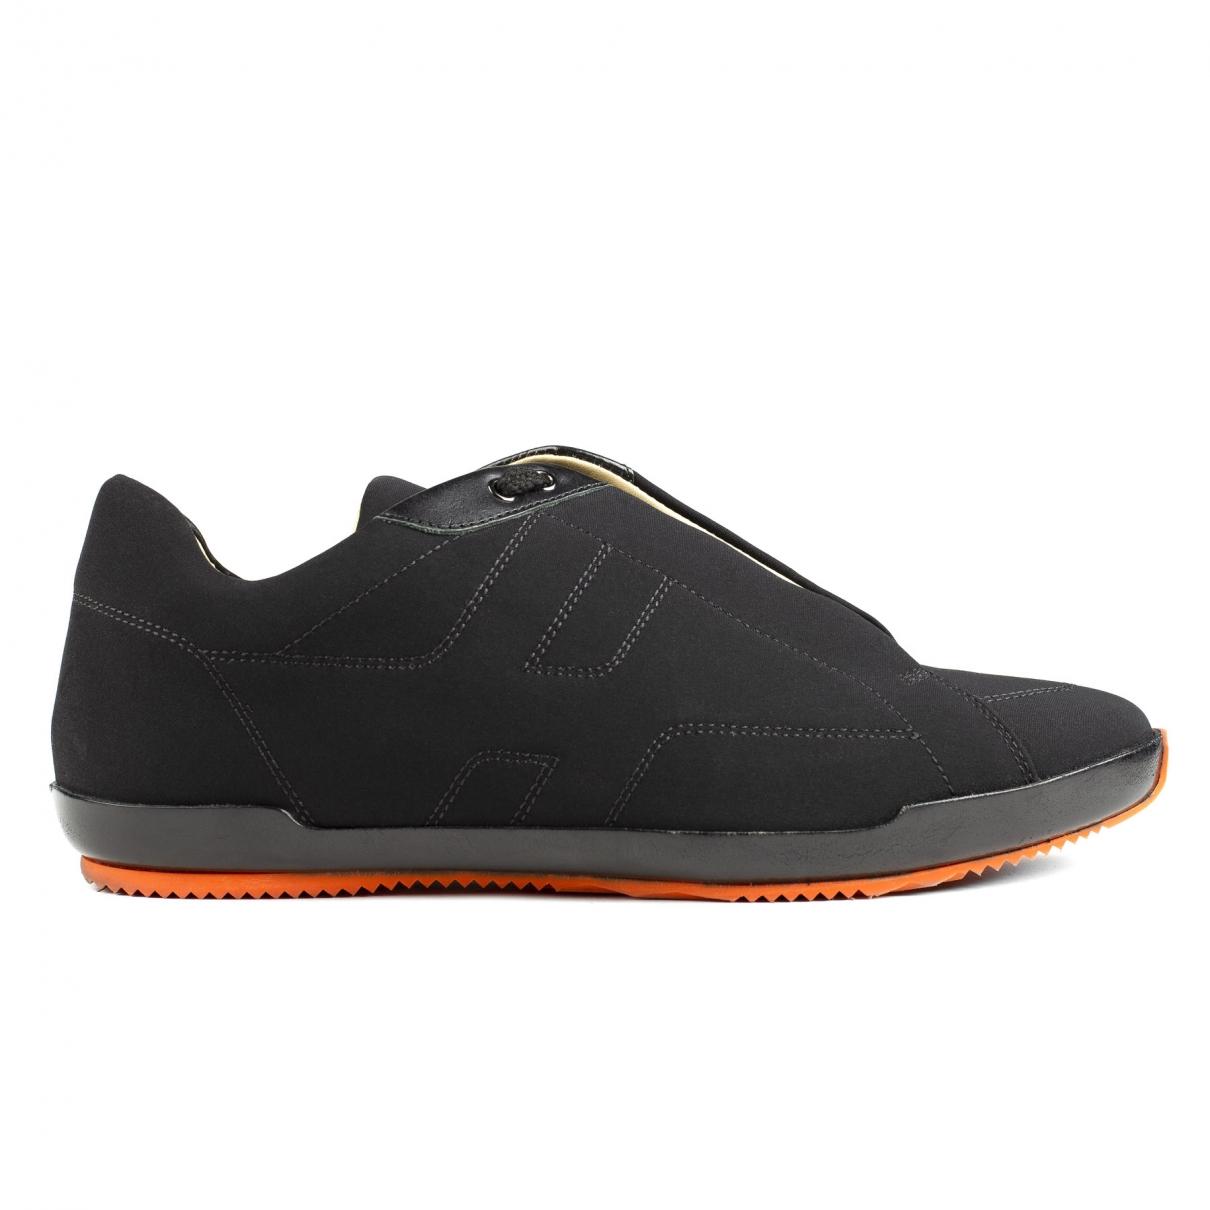 Hermes \N Sneakers in  Schwarz Leinen